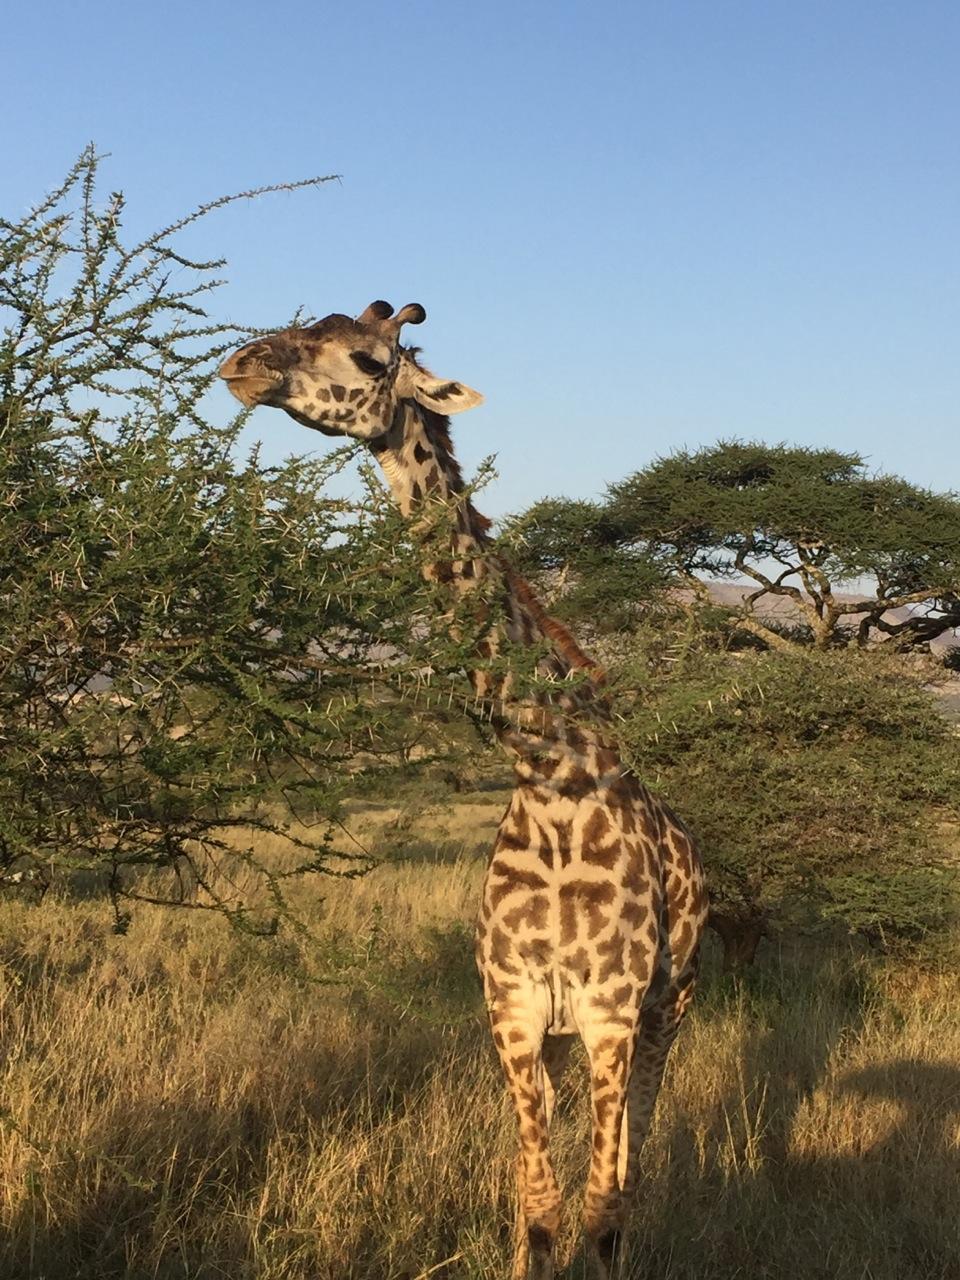 Giraffe nibbling acacia leaves in the Kilimanjaro foothills.